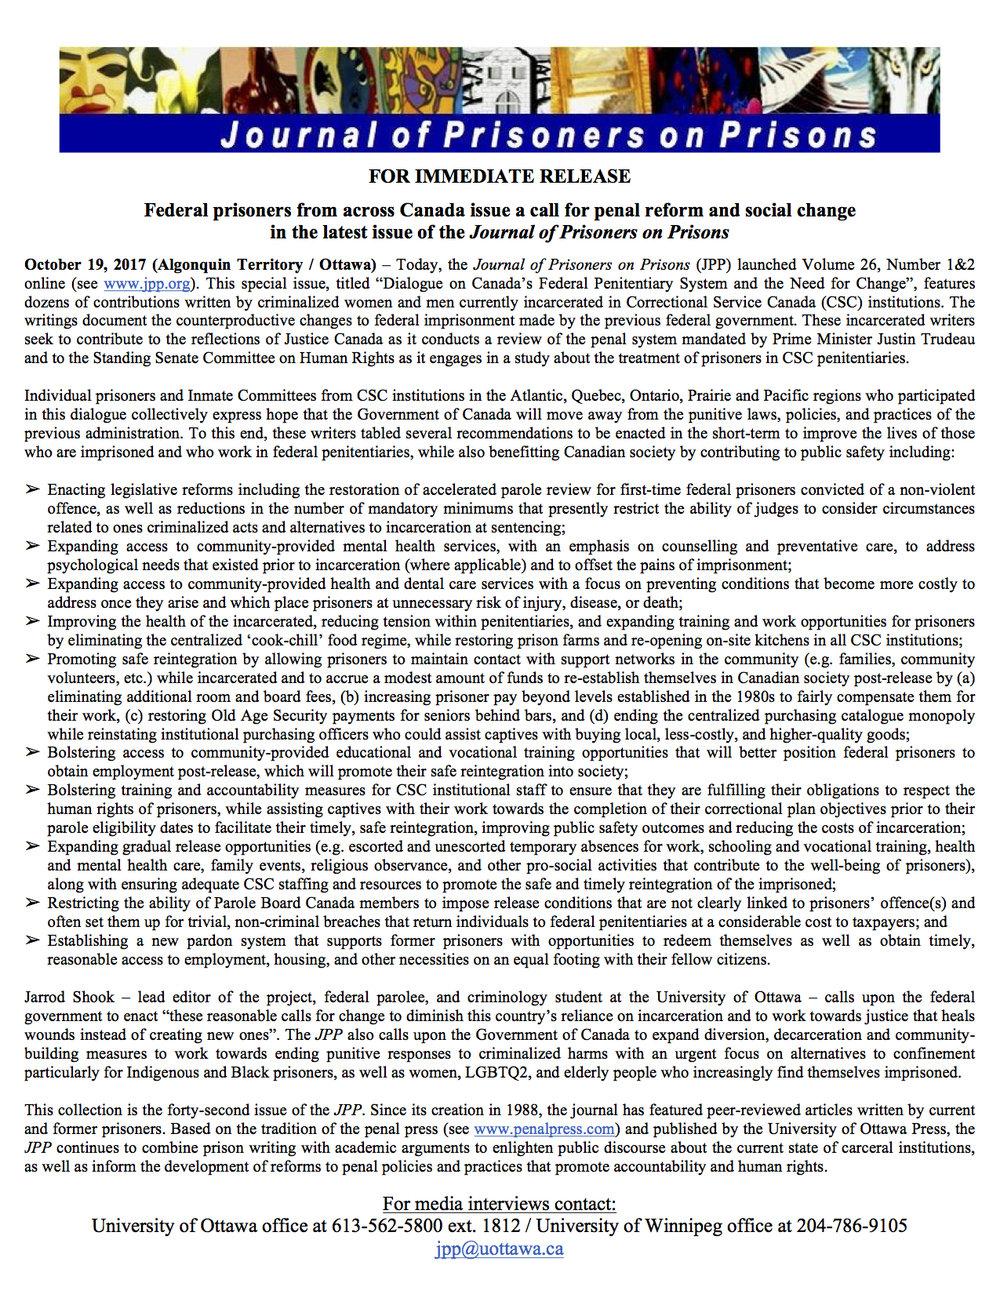 JPP 26_press release_final_October 2017 copy.jpg